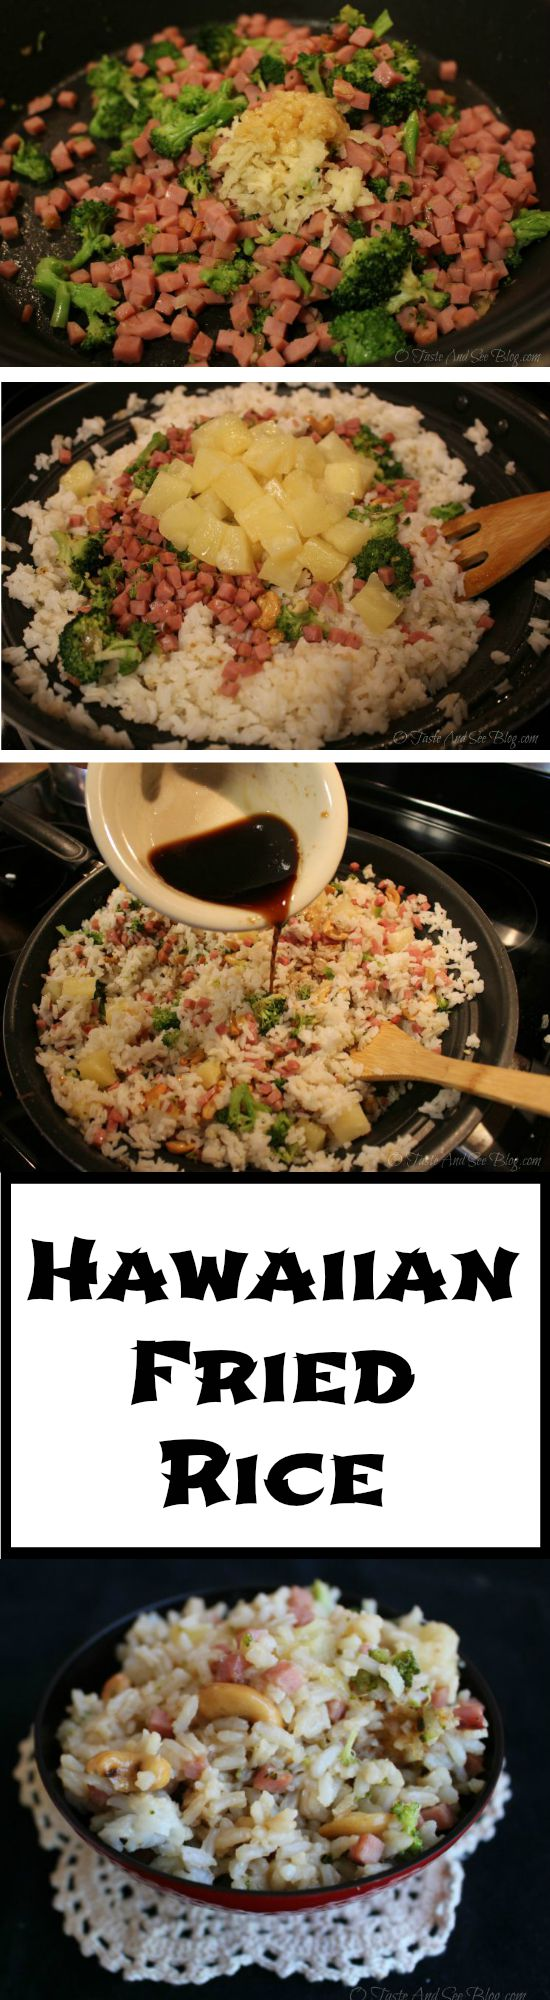 Hawaiian Fried Rice SmithfieldHambassador AD